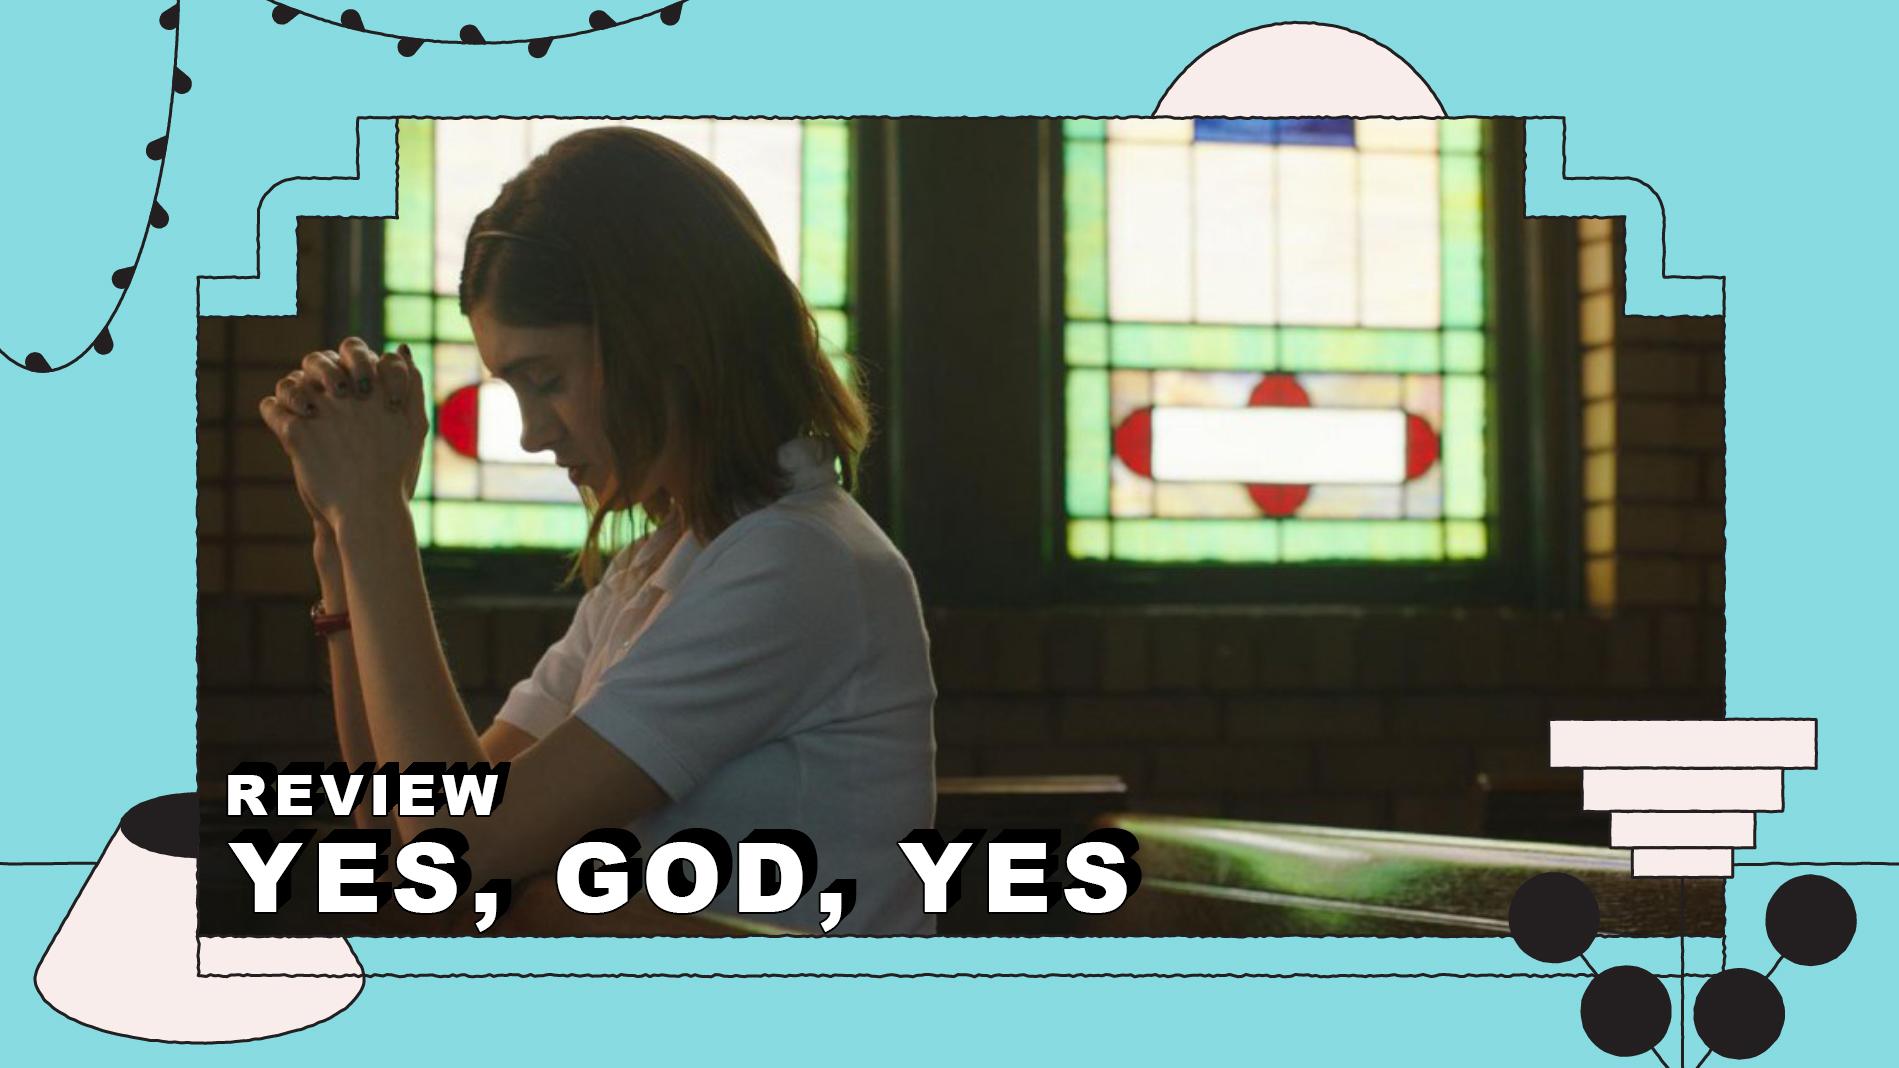 Yes God Yes Cover Image.jpg